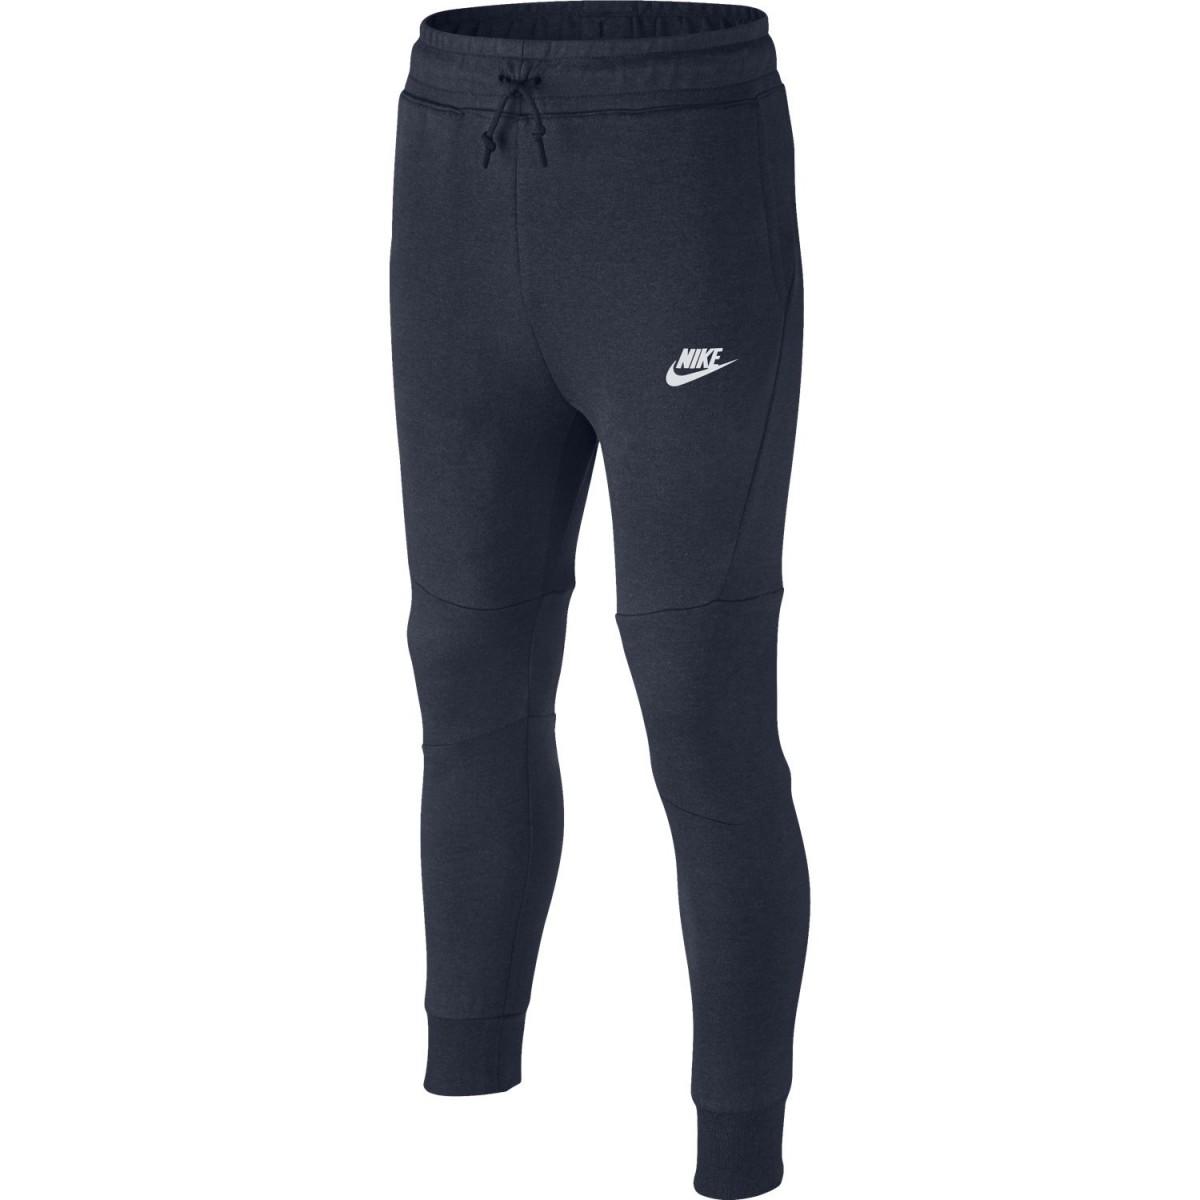 Pantalon de survêtement nike Sportswear Tech Fleece Junior